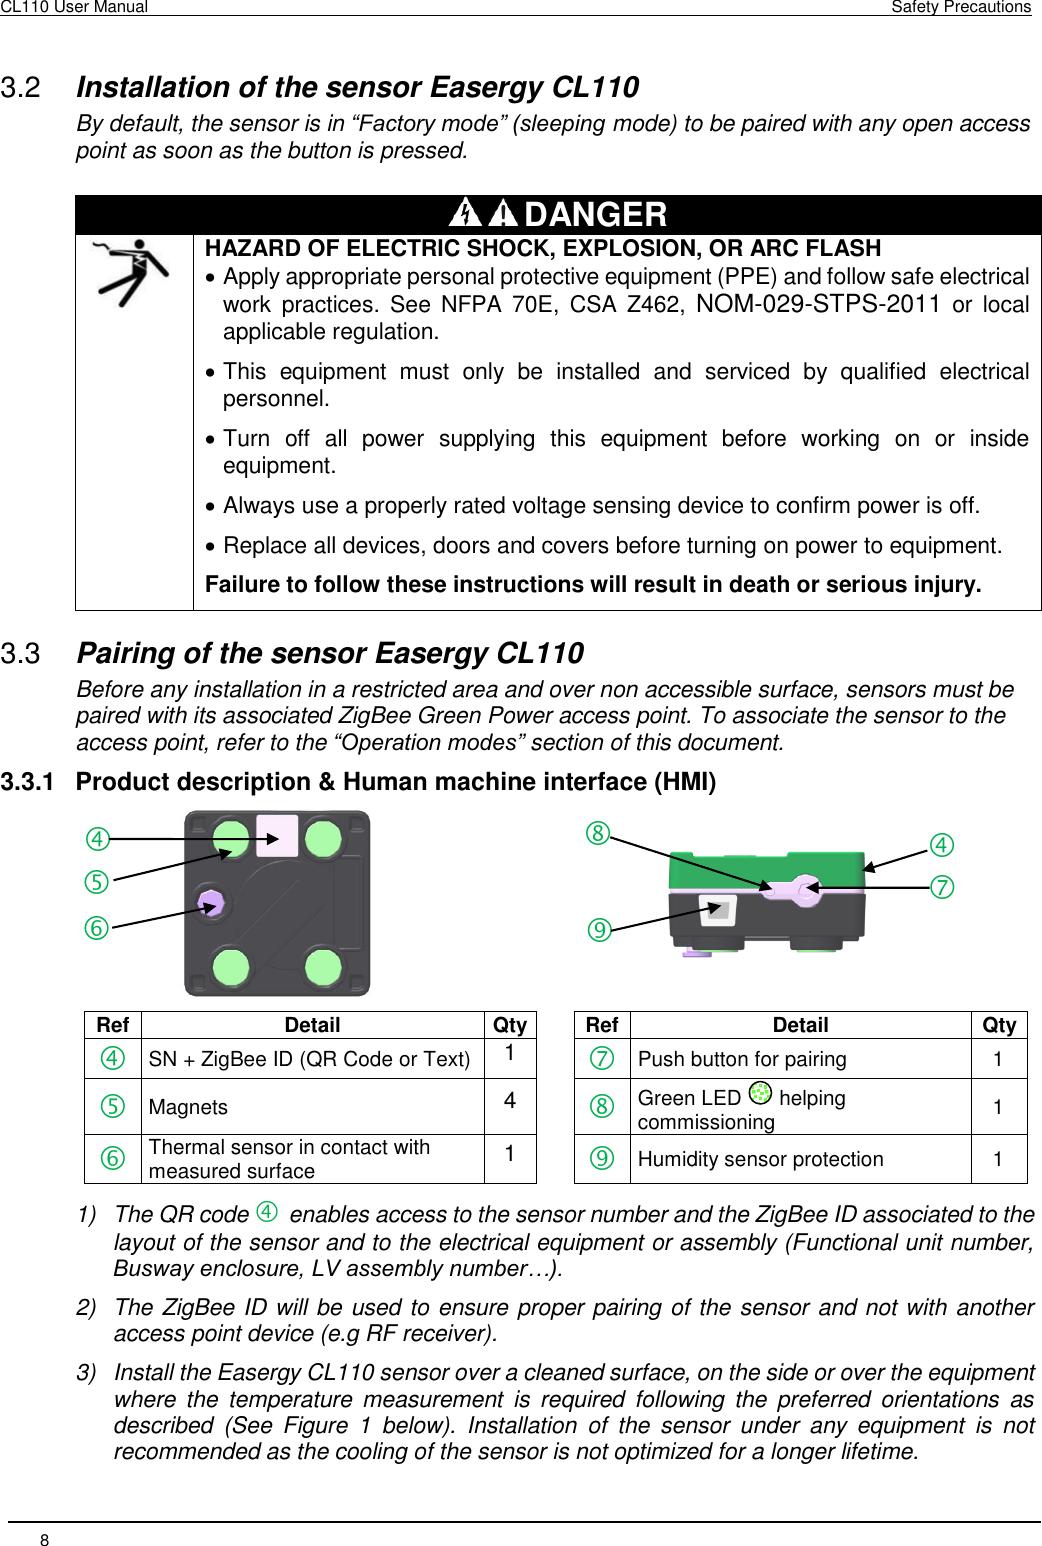 G power 3.1 manual